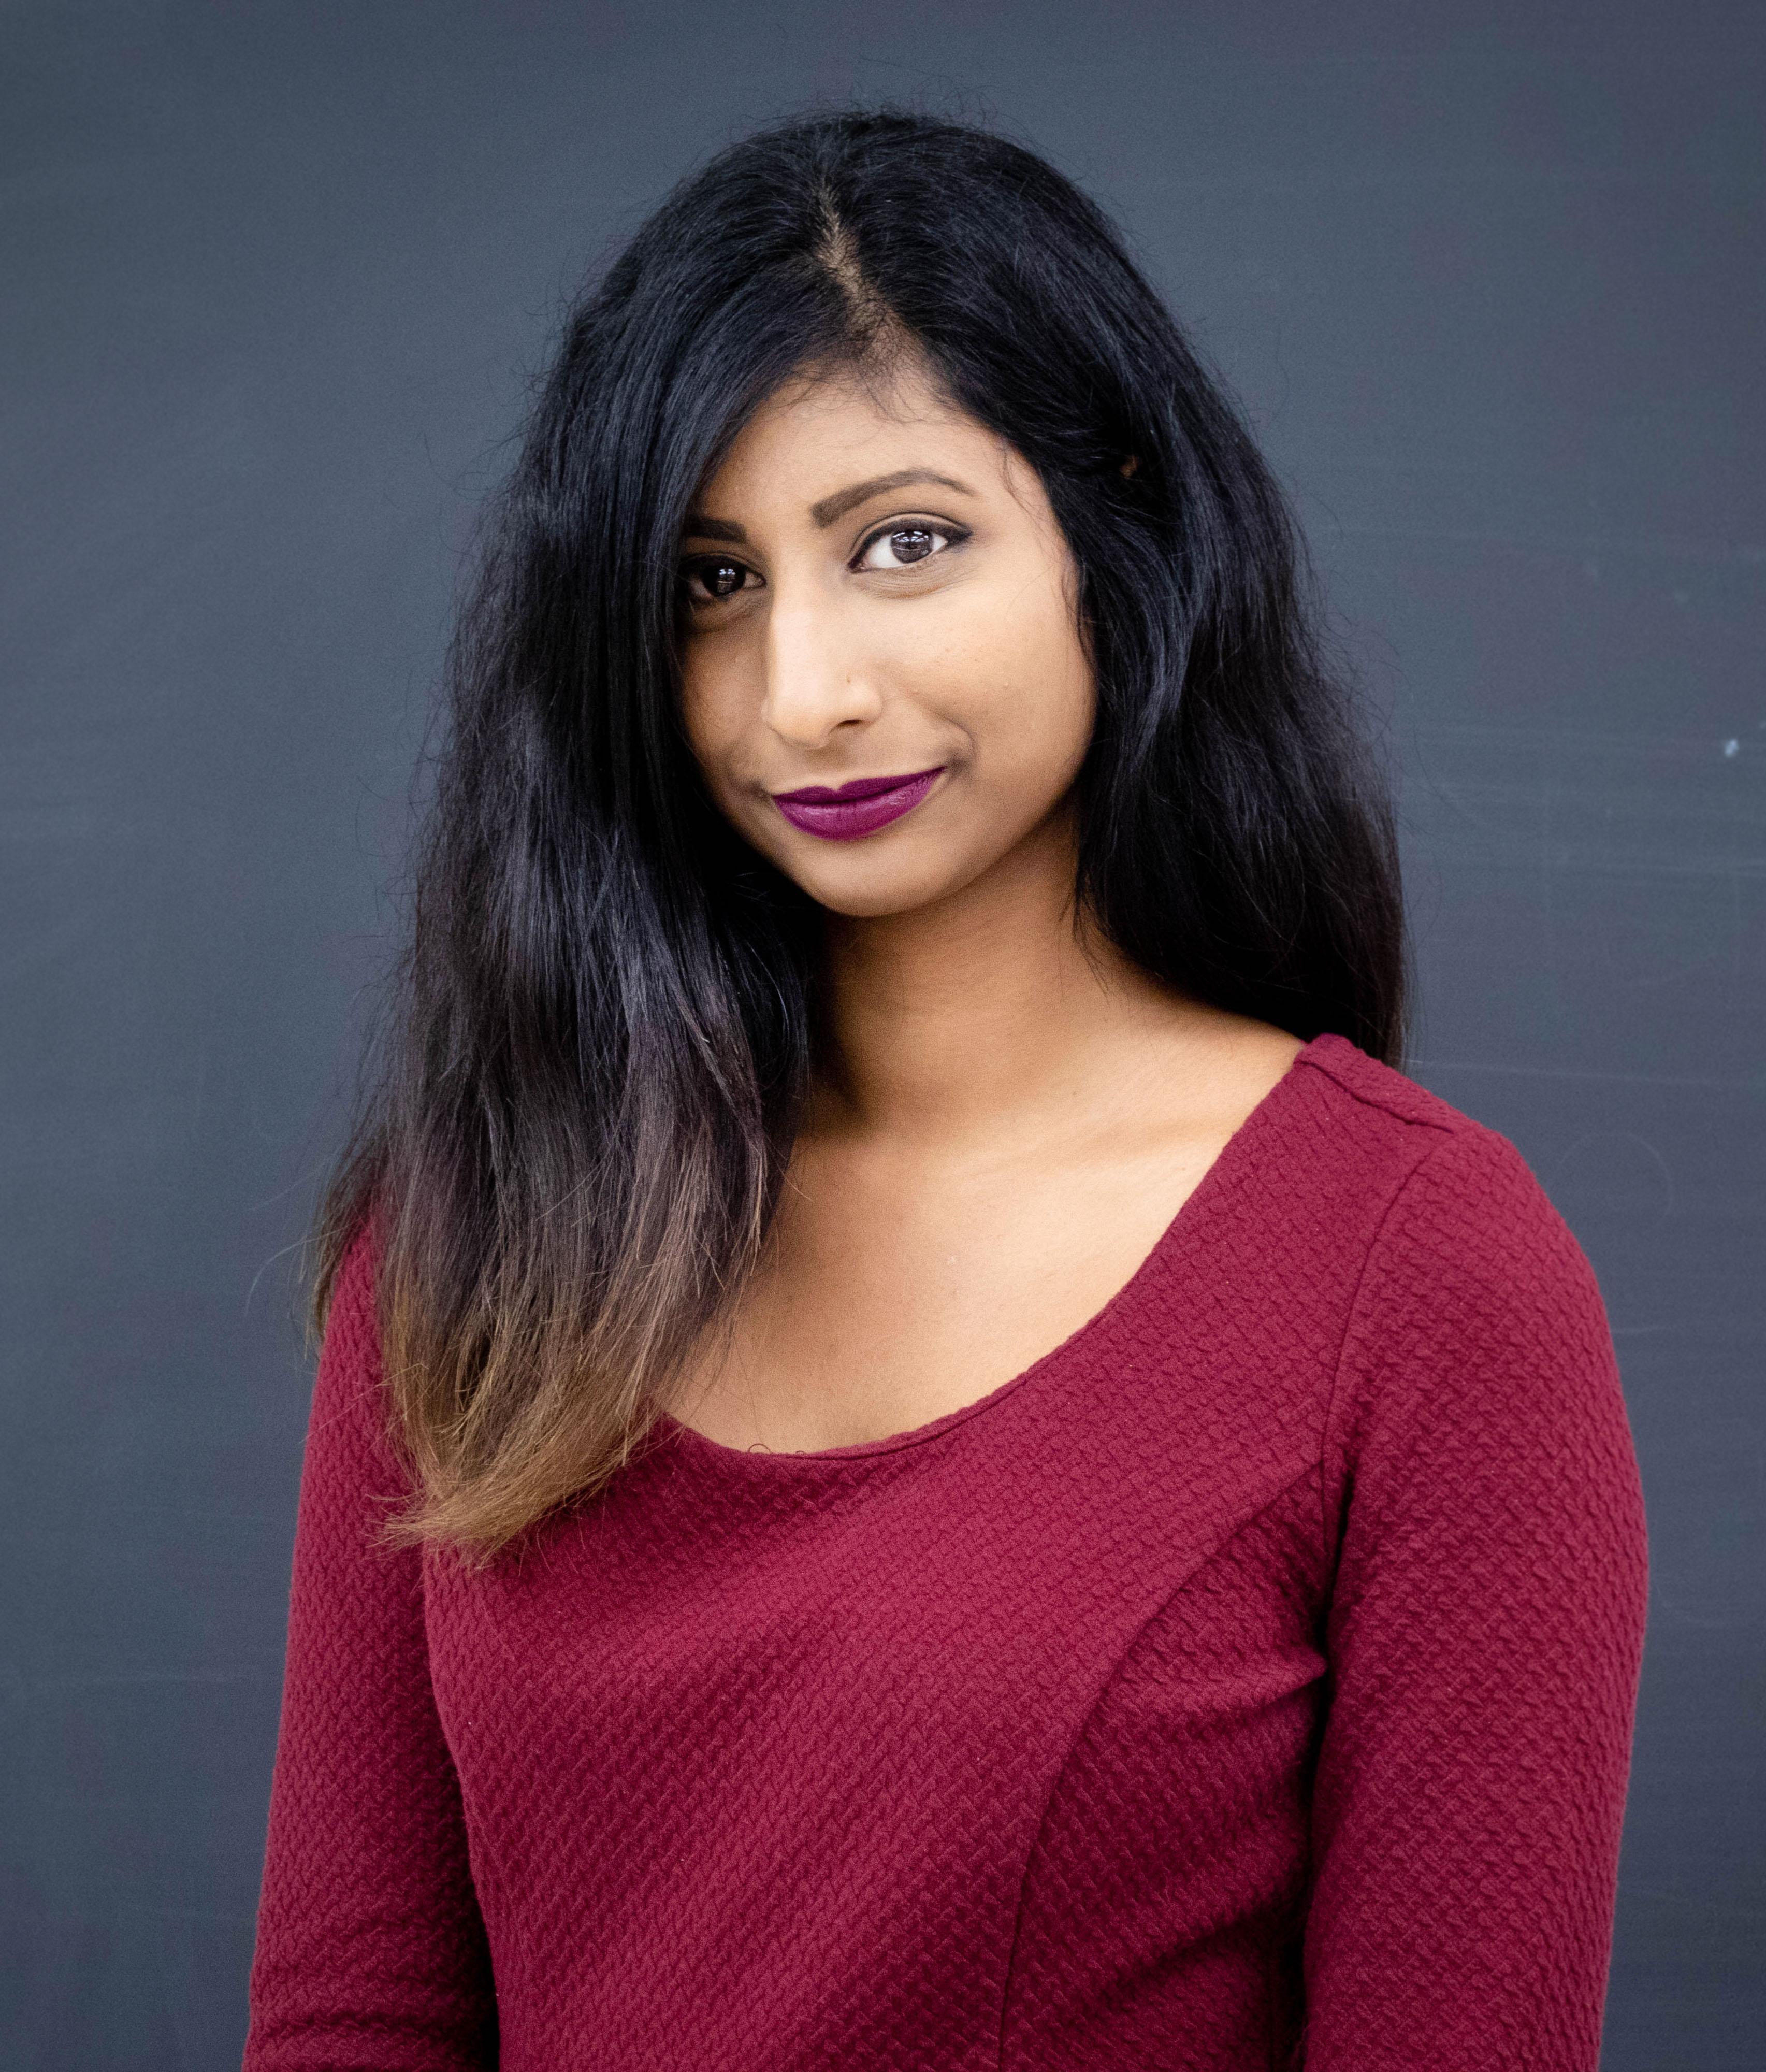 Priya Sivathason headshot profile